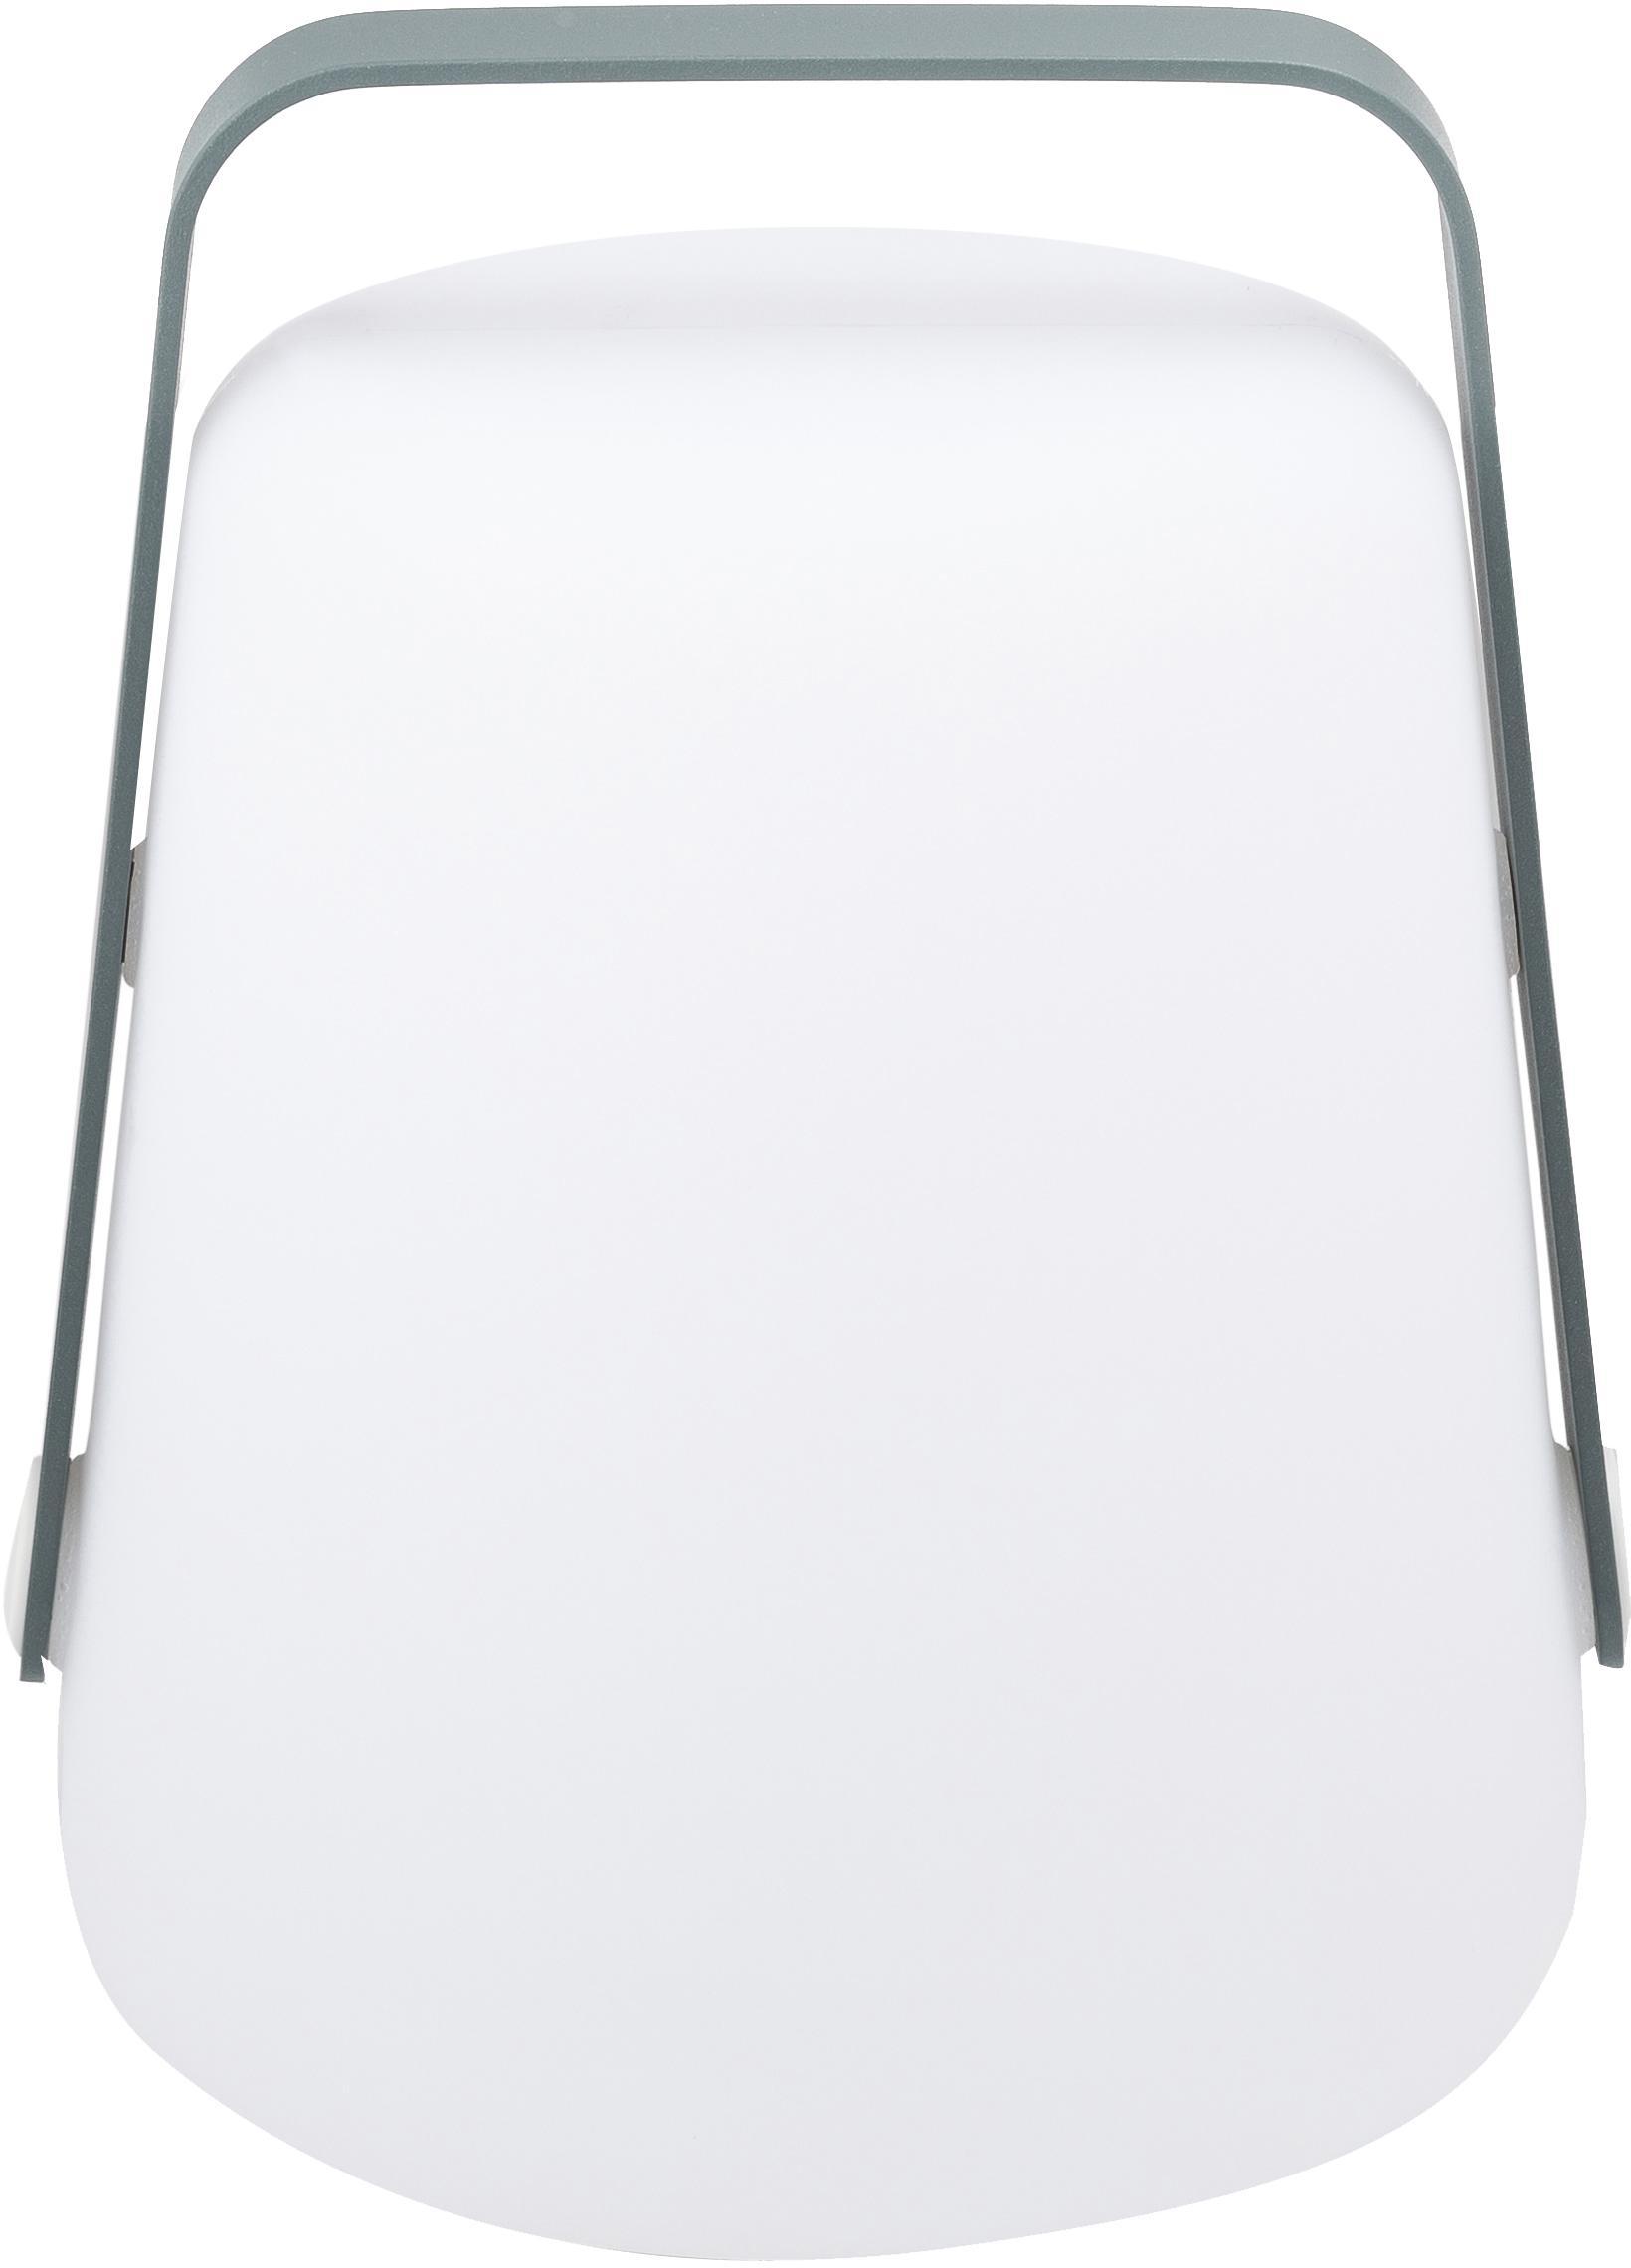 Mobile LED Aussenleuchte Balad, Lampenschirm: Polyethen, für den Aussen, Griff: Aluminium, lackiert, Gewittergrau, Ø 19 x H 25 cm